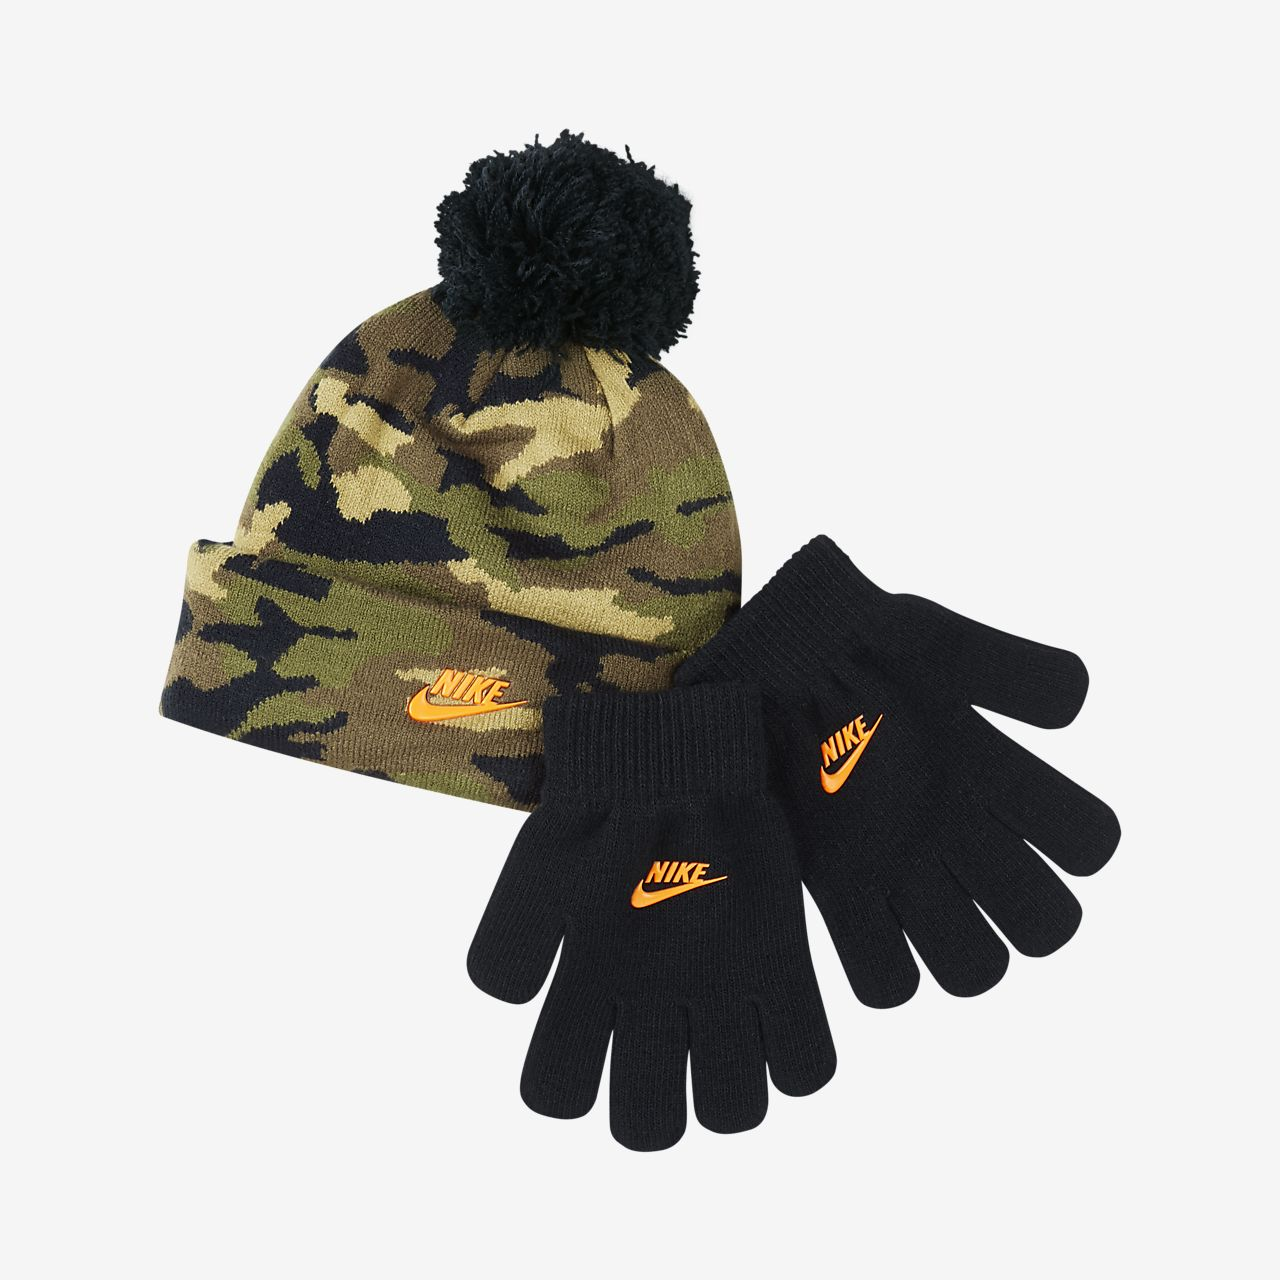 Completo beanie e guanti Nike - Bambini